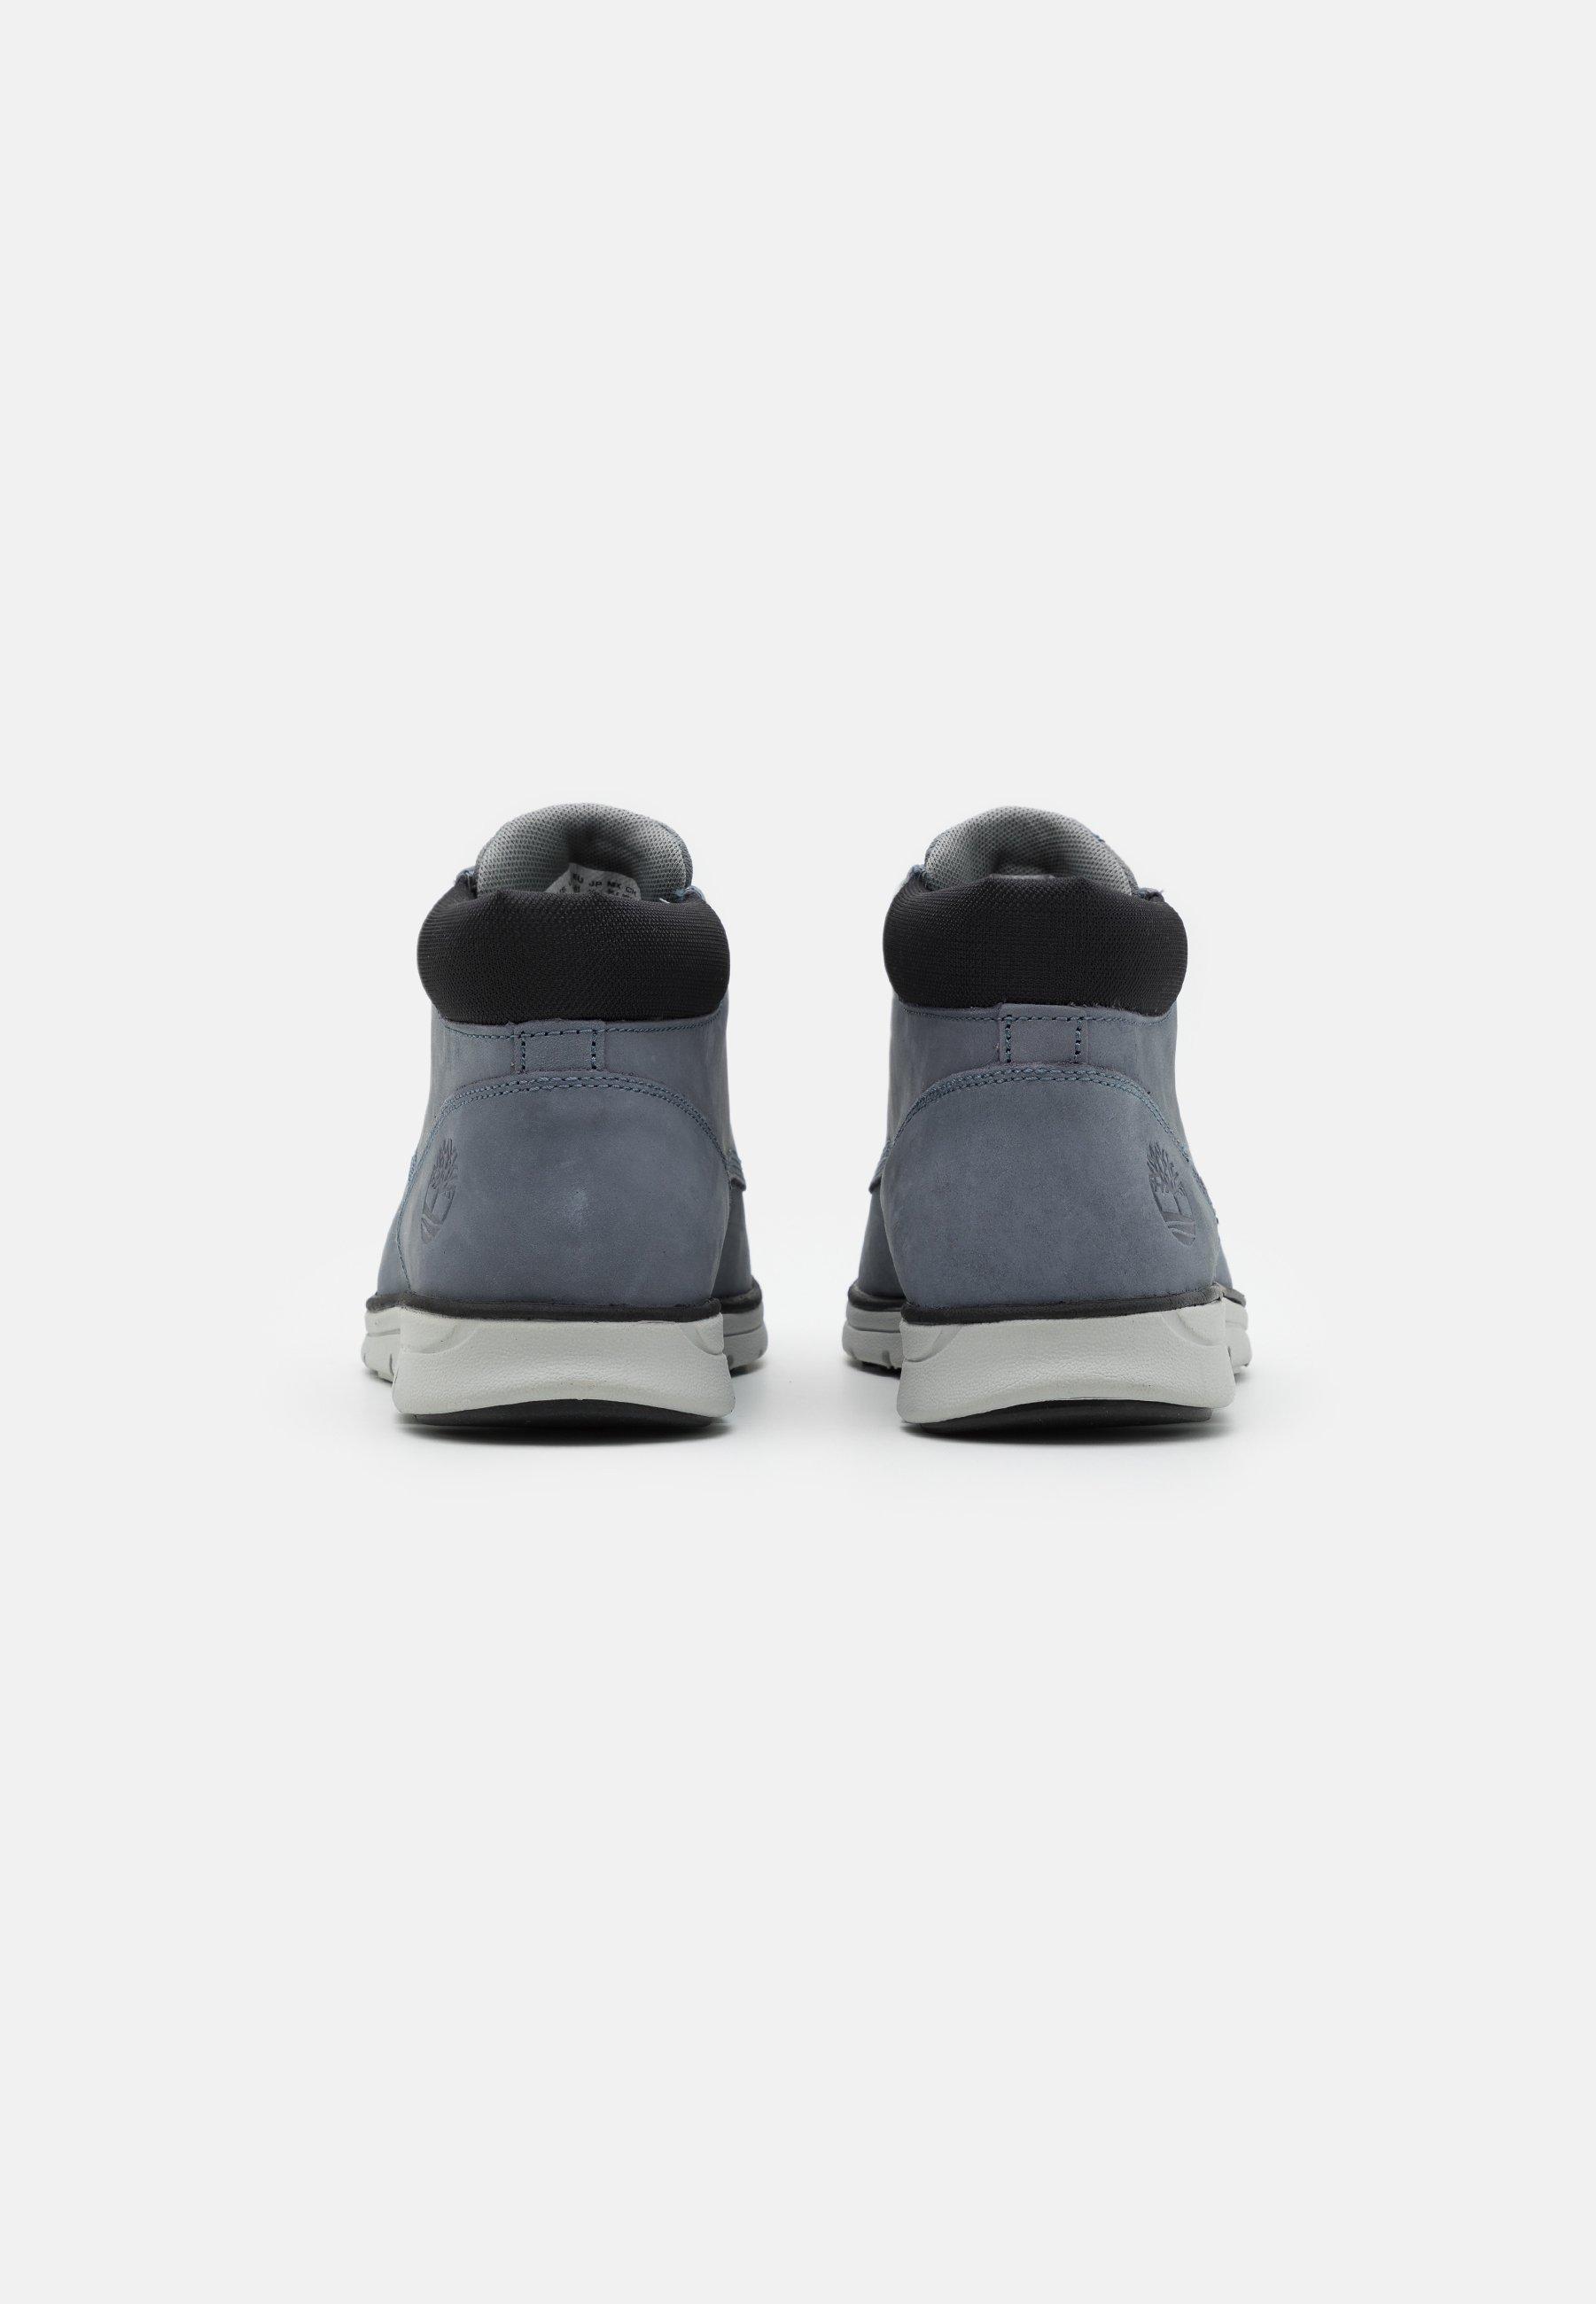 Homme BRADSTREET CHUKKA - Chaussures à lacets - light grey